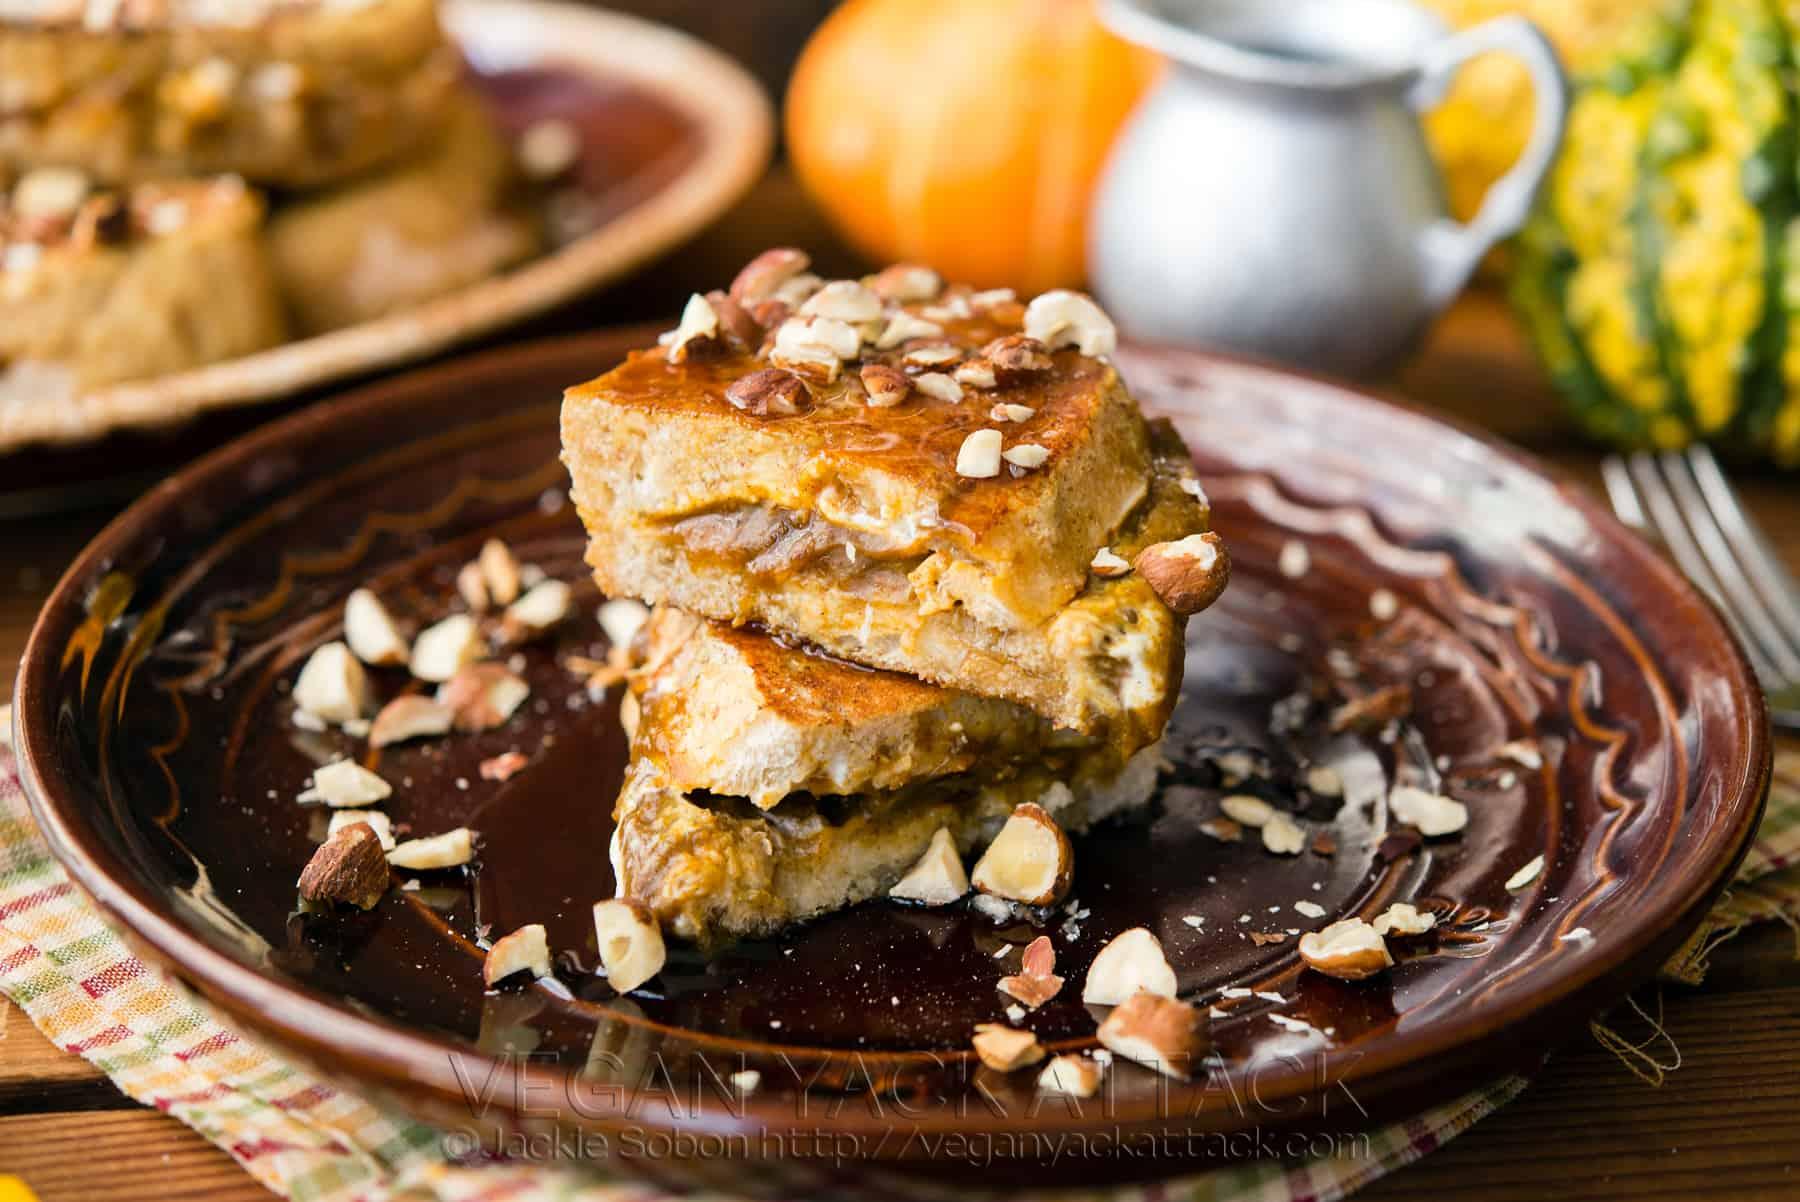 Pumpkin and Cream Cheese Stuffed French Toast